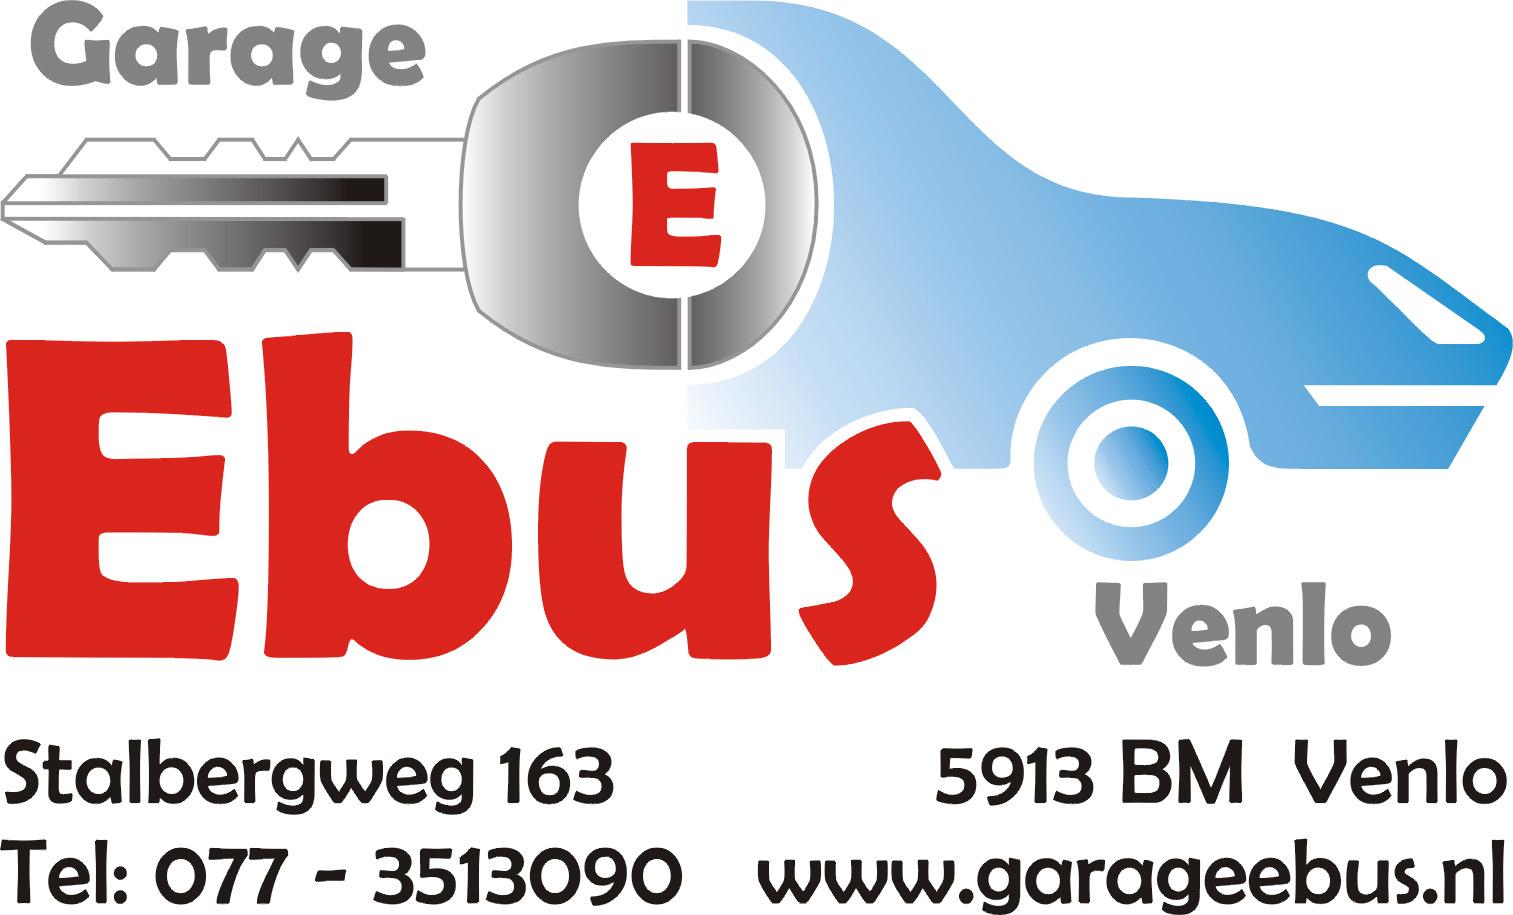 http://www.garageebus.nl/